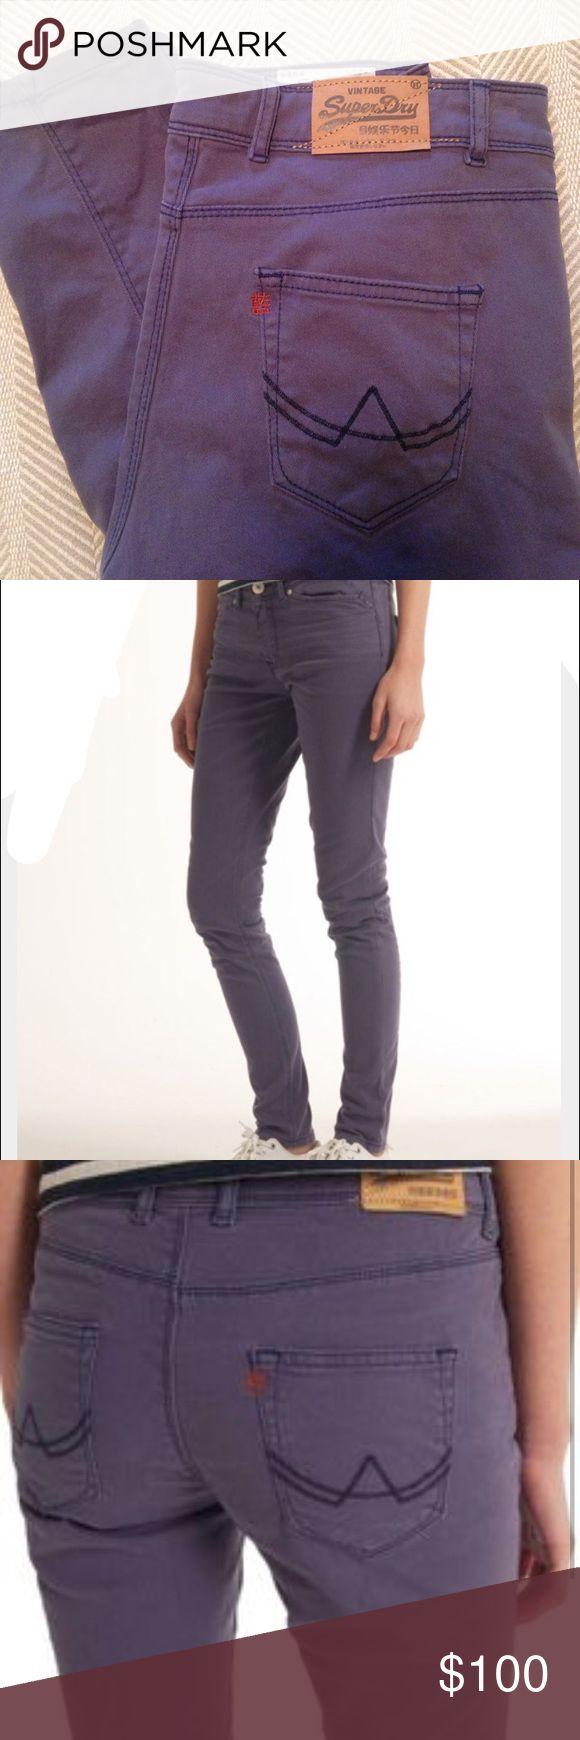 SuperDry Strutt Sulphur Purple Skinny Jeans SuperDry Strutt Sulphur Purple Skinny Jeans. Size 29, 32L. Superdry Jeans Skinny